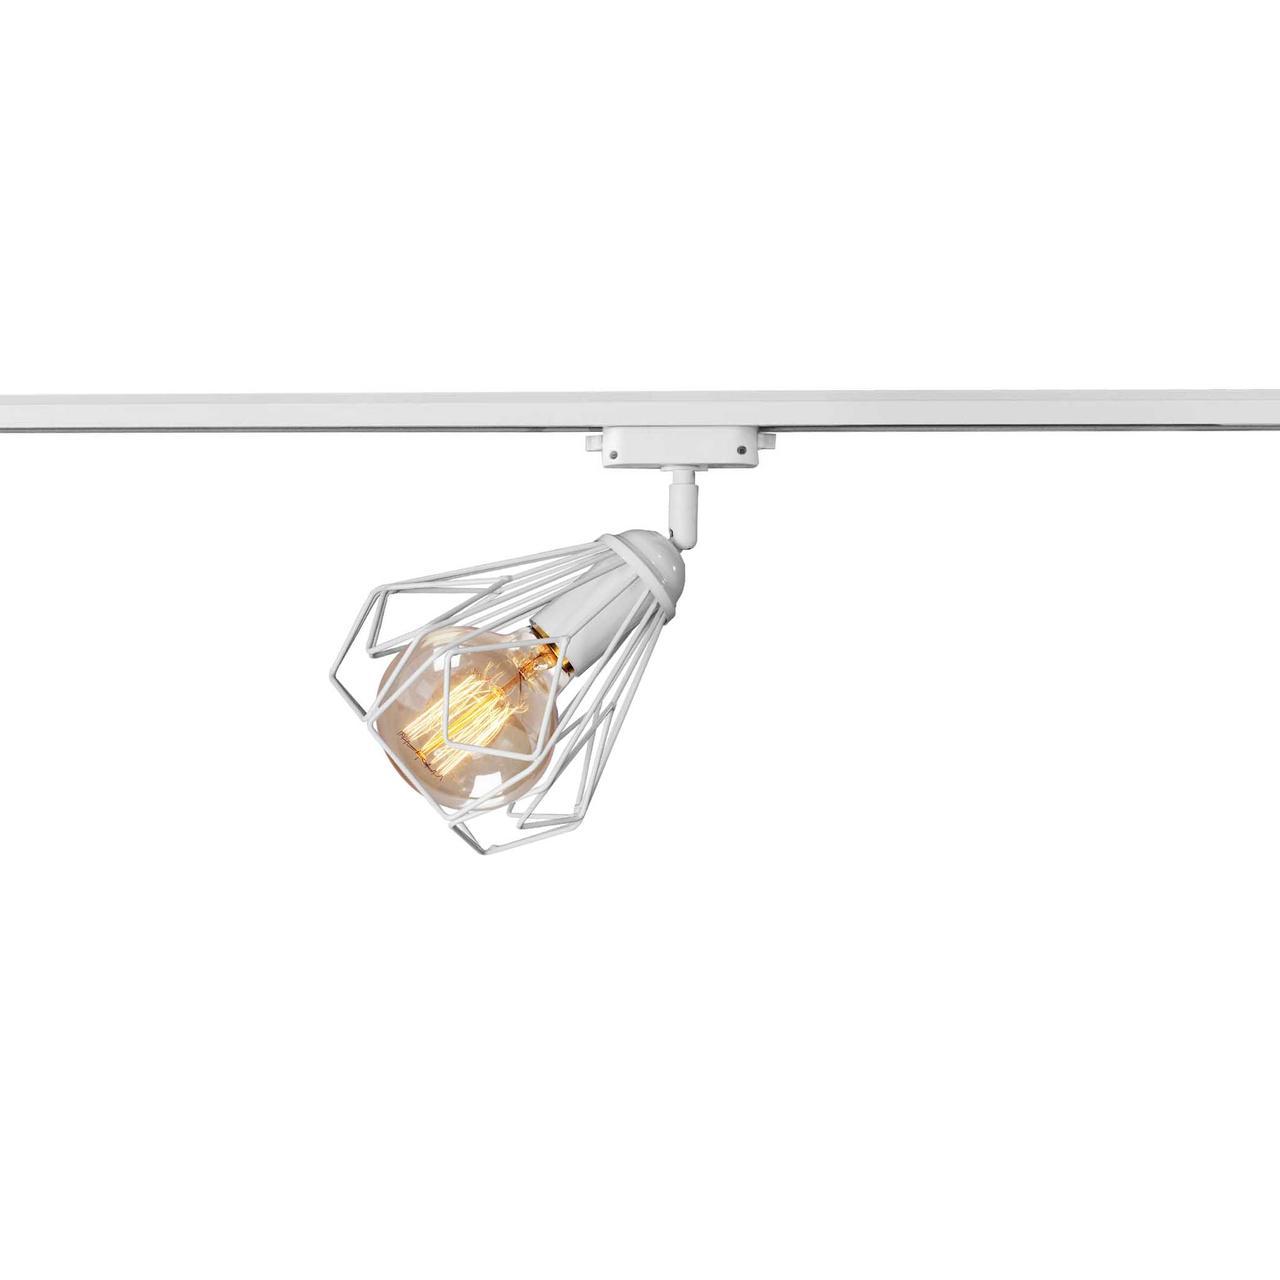 Светильник трековый под лампу Е27 MSK Electric NT 5381W белый